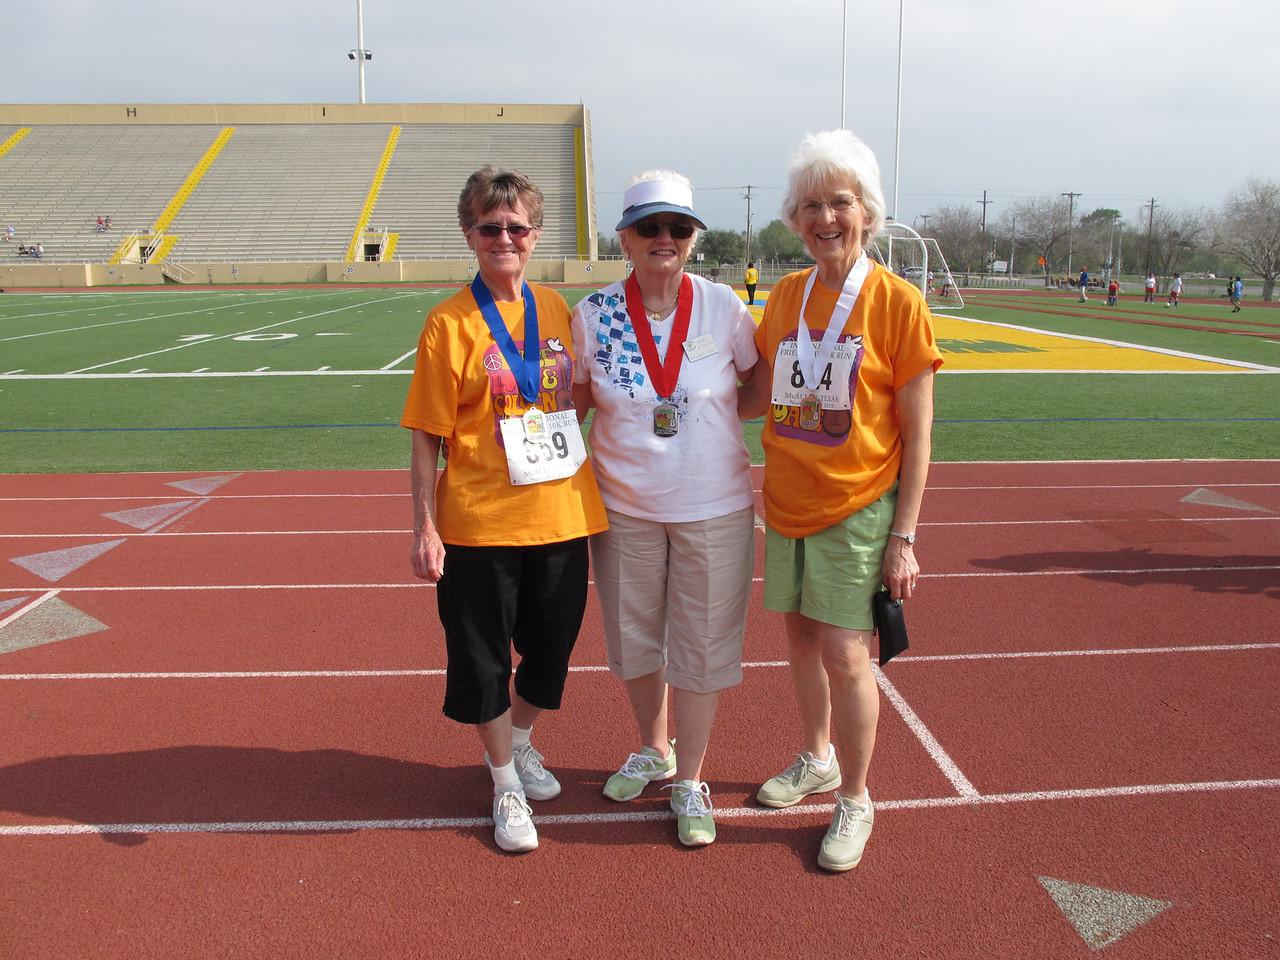 Racewalk Women 75-79 (L-R) 1st Place - Carlene Jacobs (Texas Trails), 2nd Place Faith Bradley (Tropic Star), 3rd Place - Mabel Viselka (Bit O Heaven)